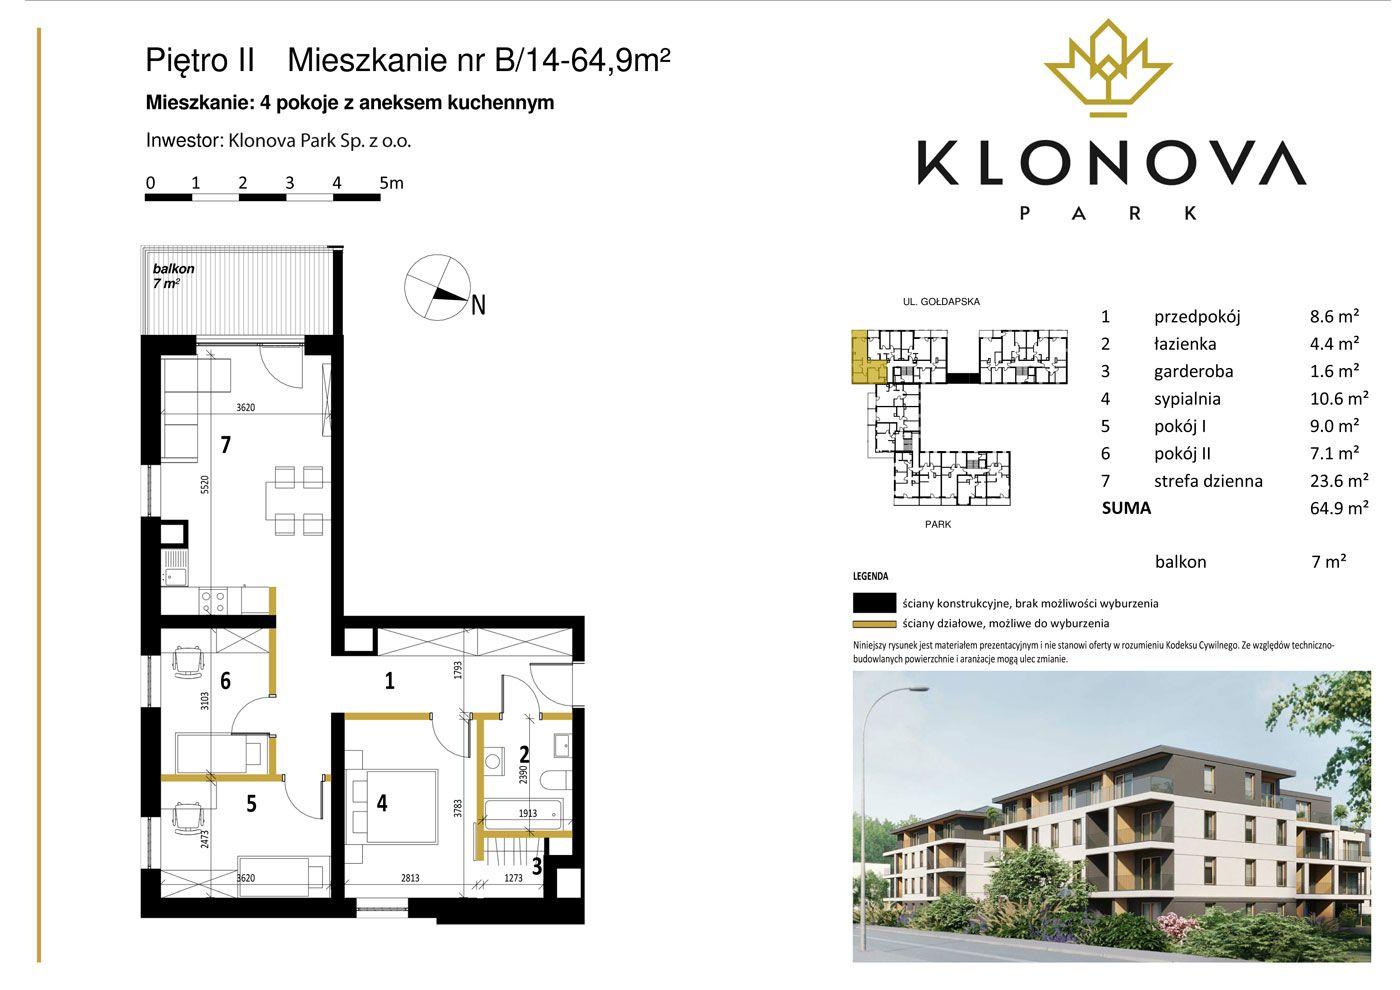 Apartamenty Klonova Park - Plan mieszkania B/14